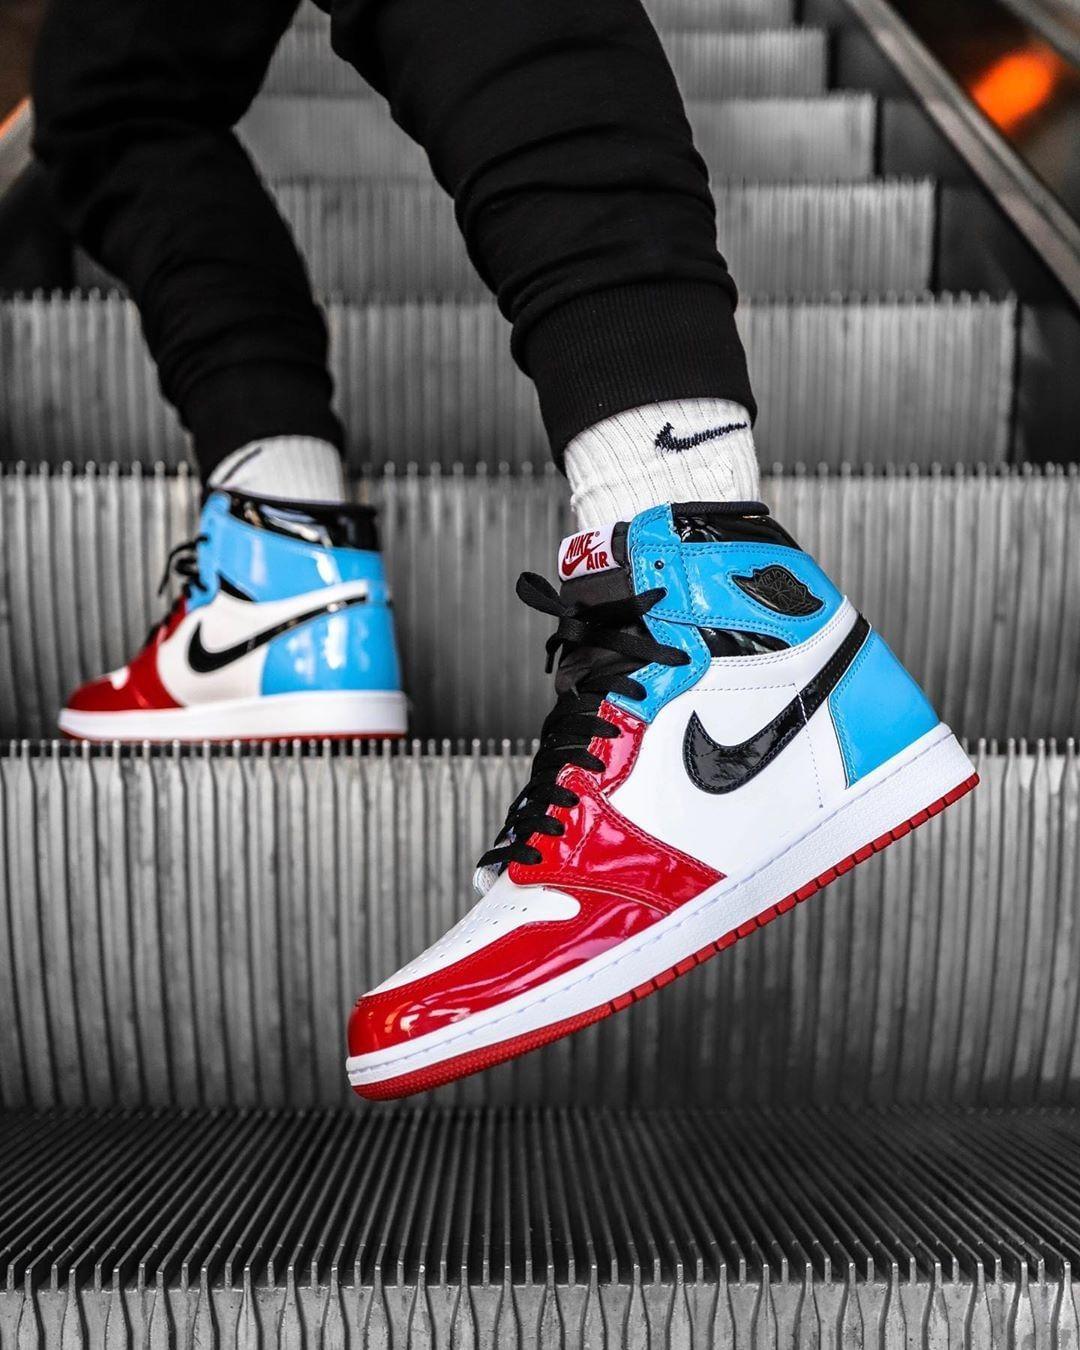 Air Jordan 1 Retro High Fearless OG en 2020 | Nike